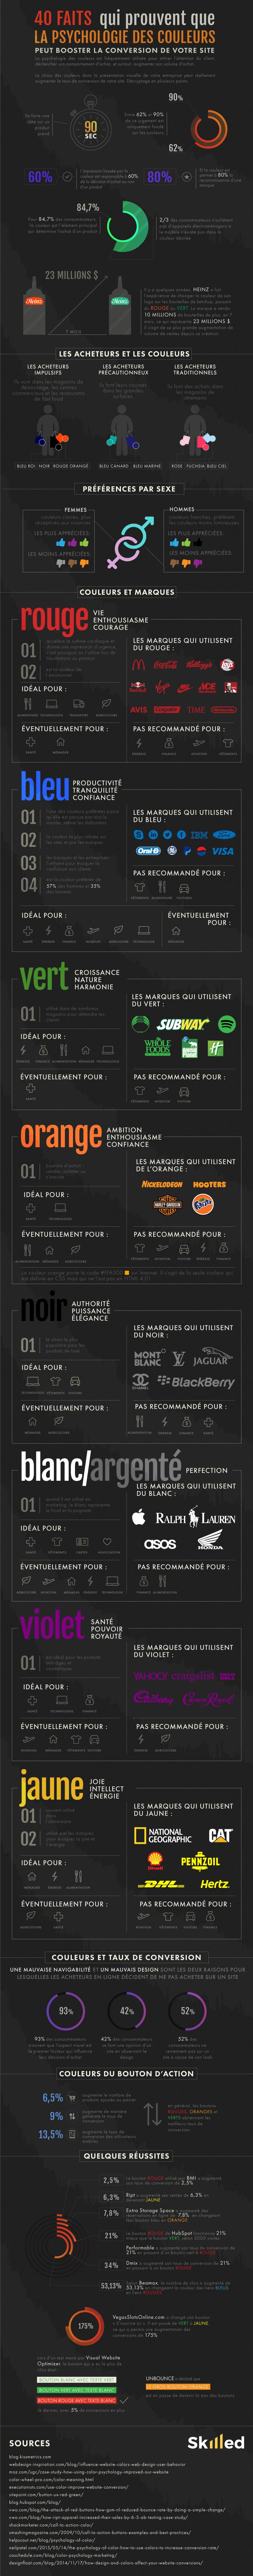 infographie-psychologie-couleurs